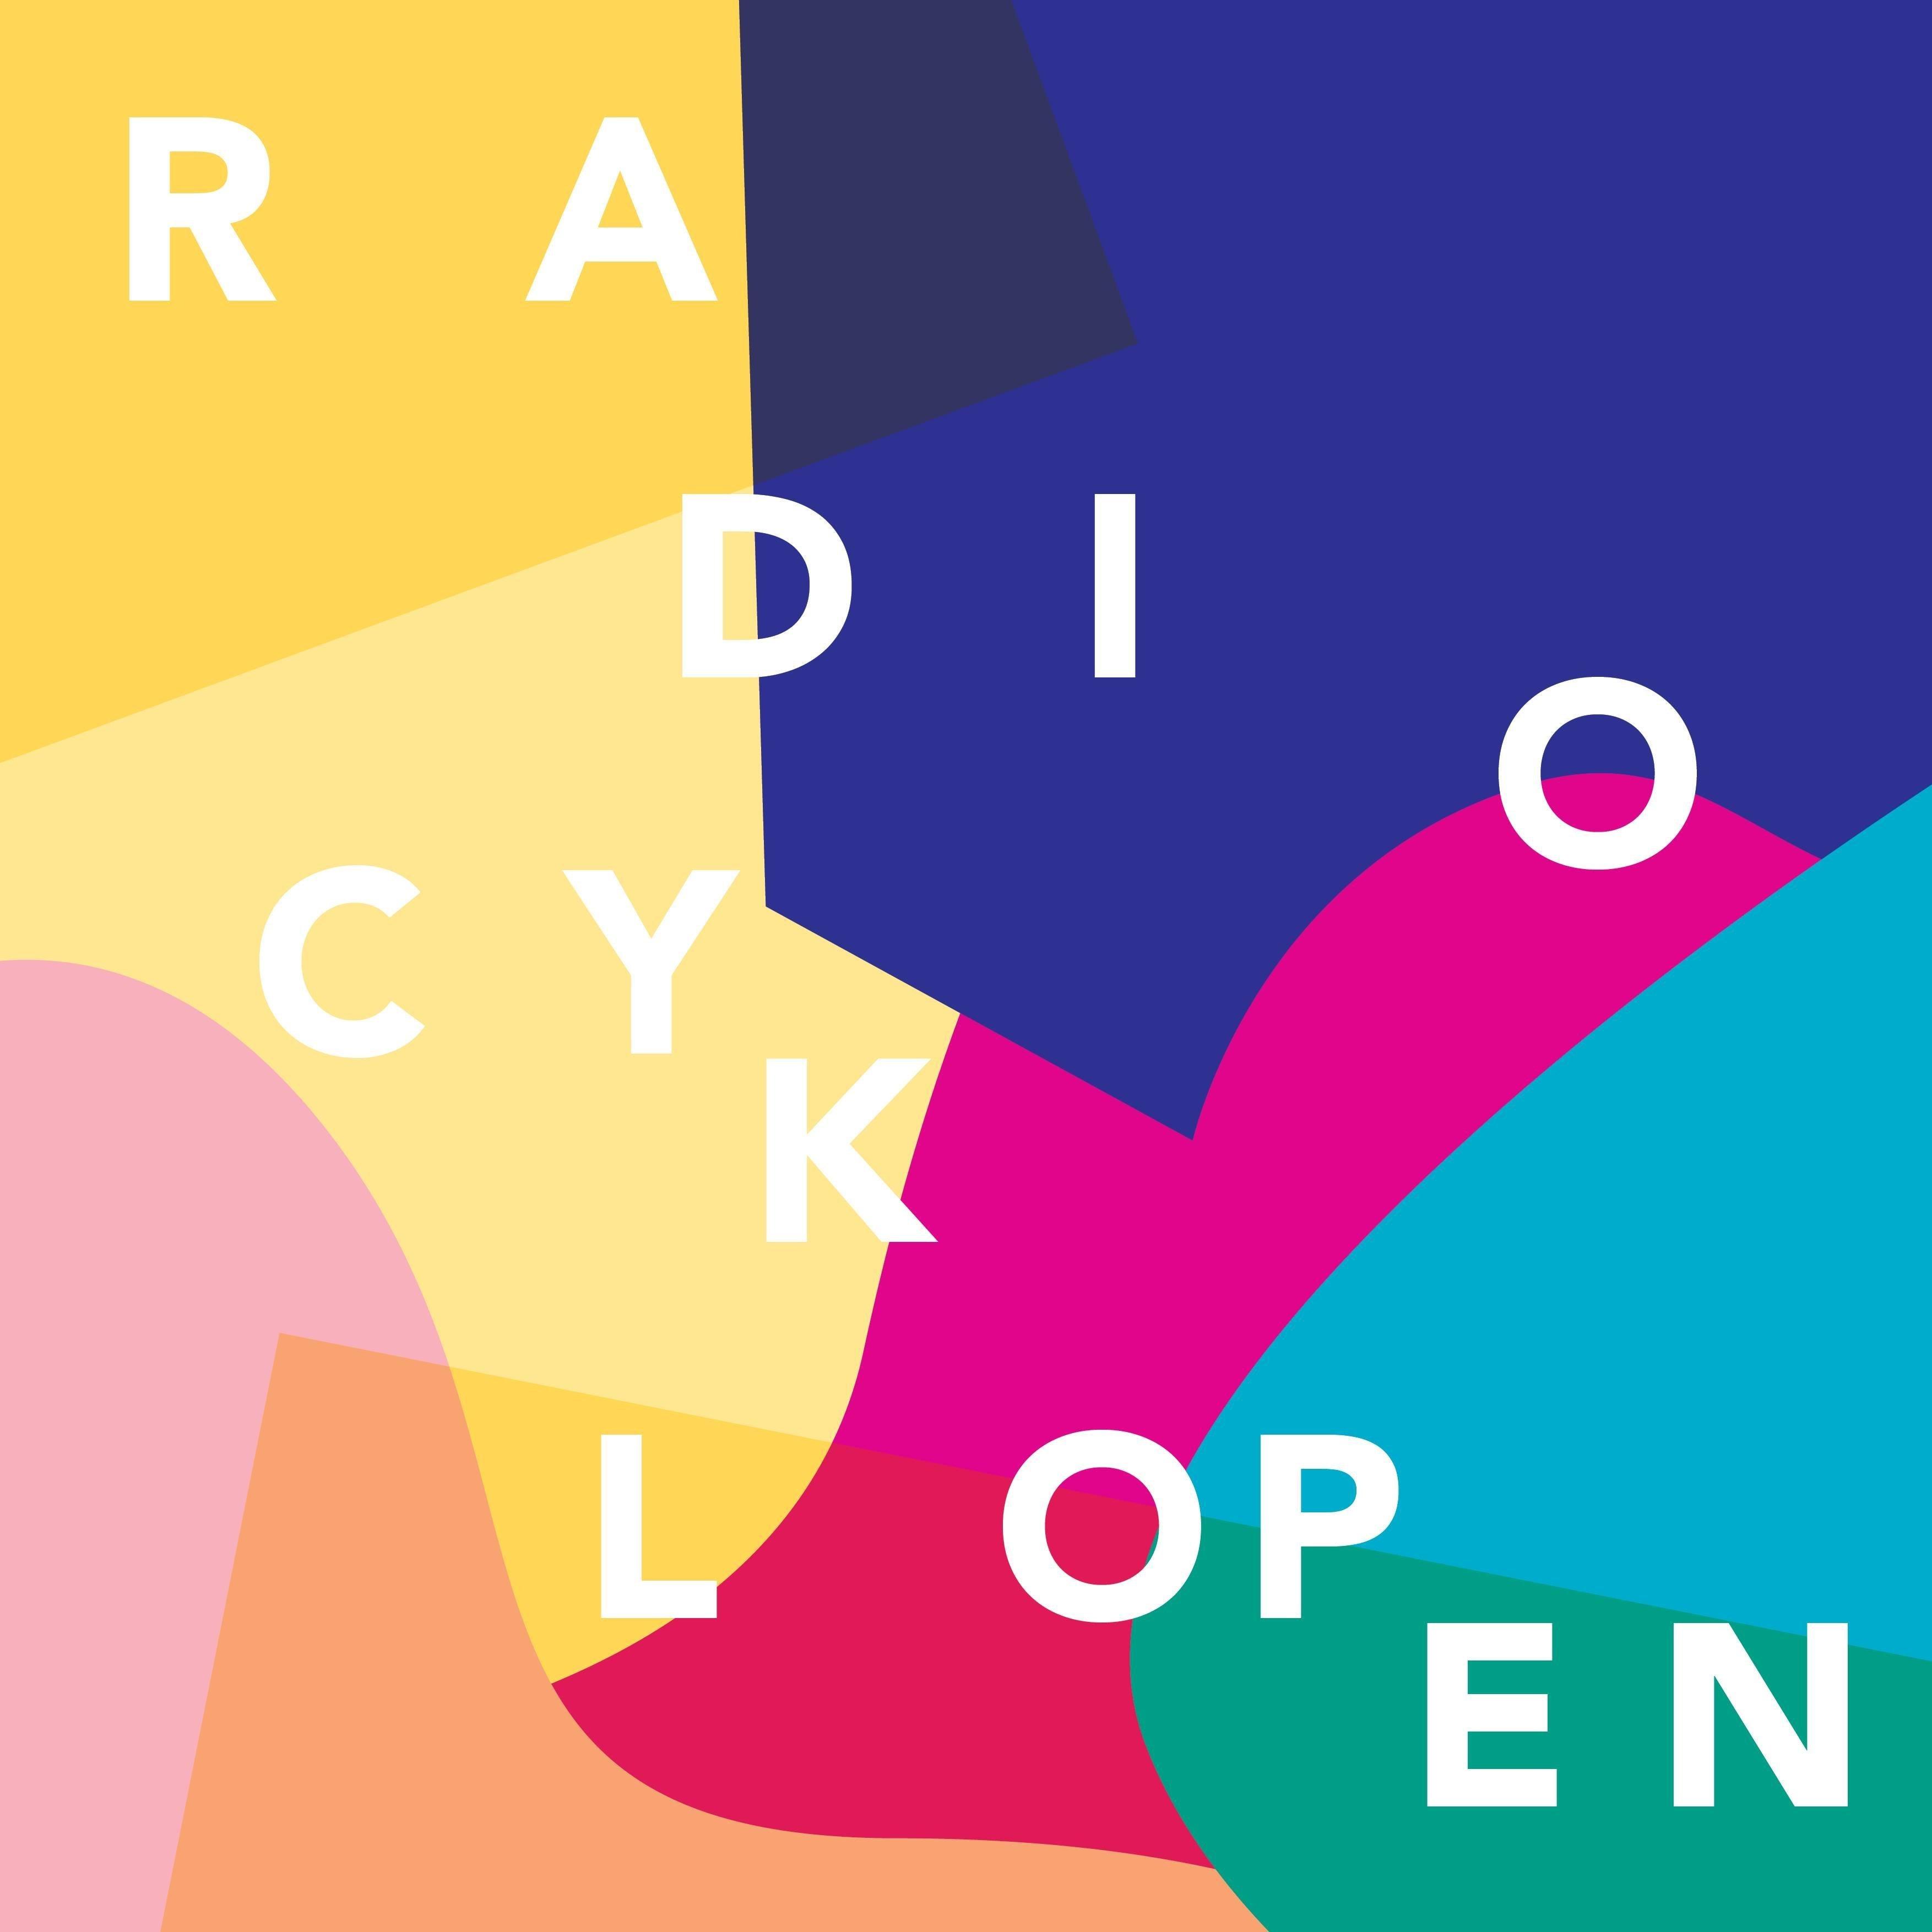 Radio Cyklopen #12: Tredje vågen